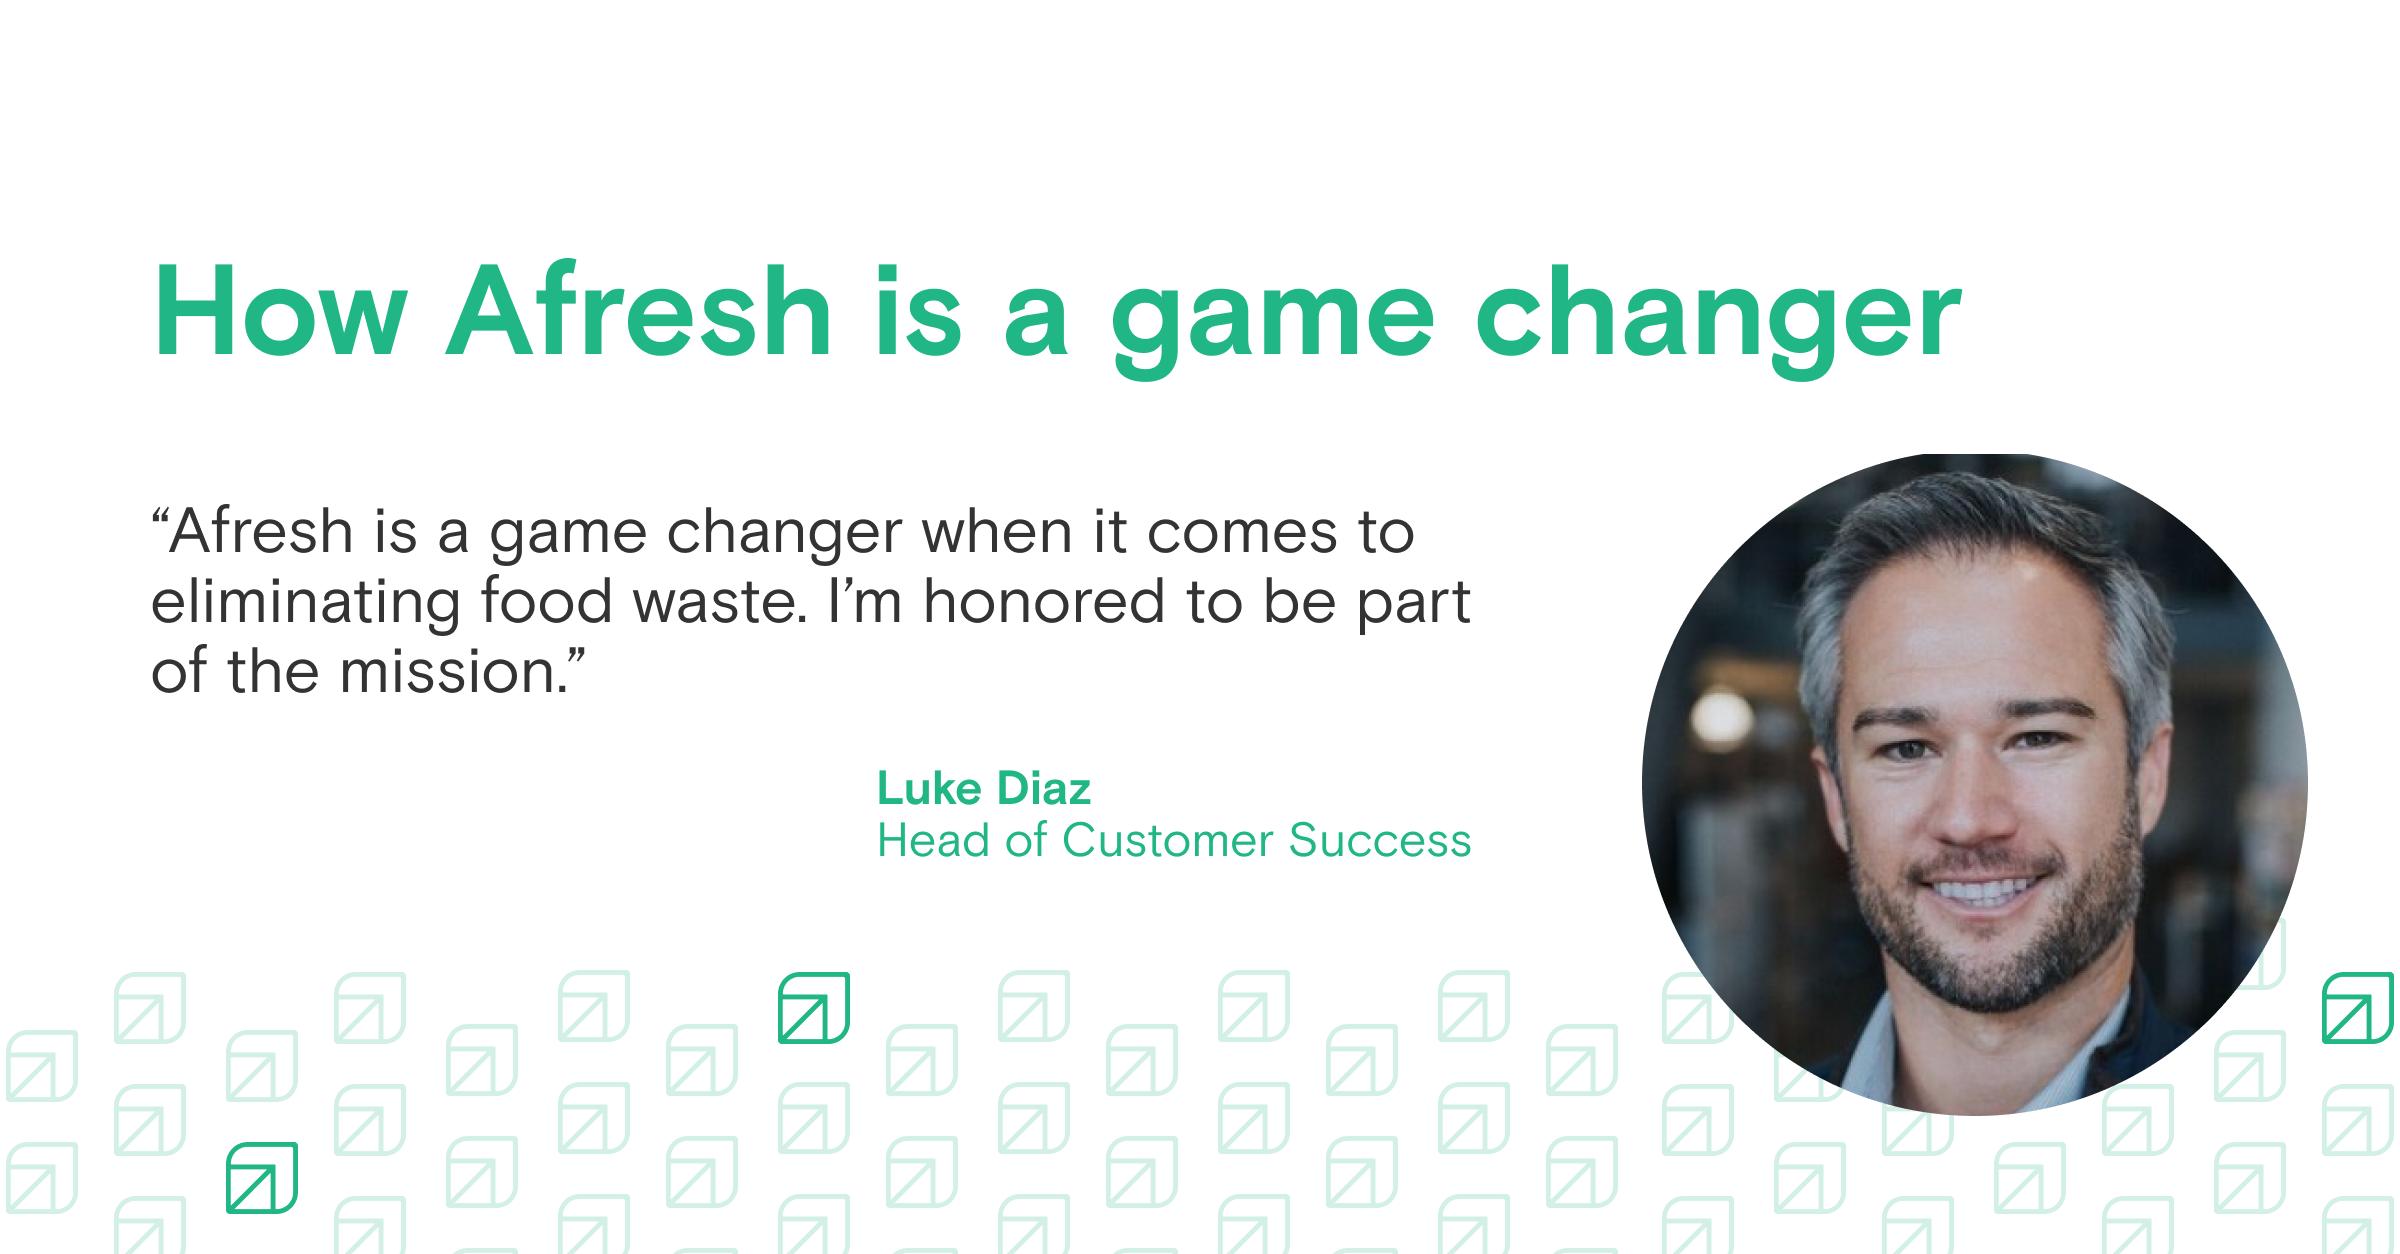 New to the Bunch: Luke, Head of Customer Success